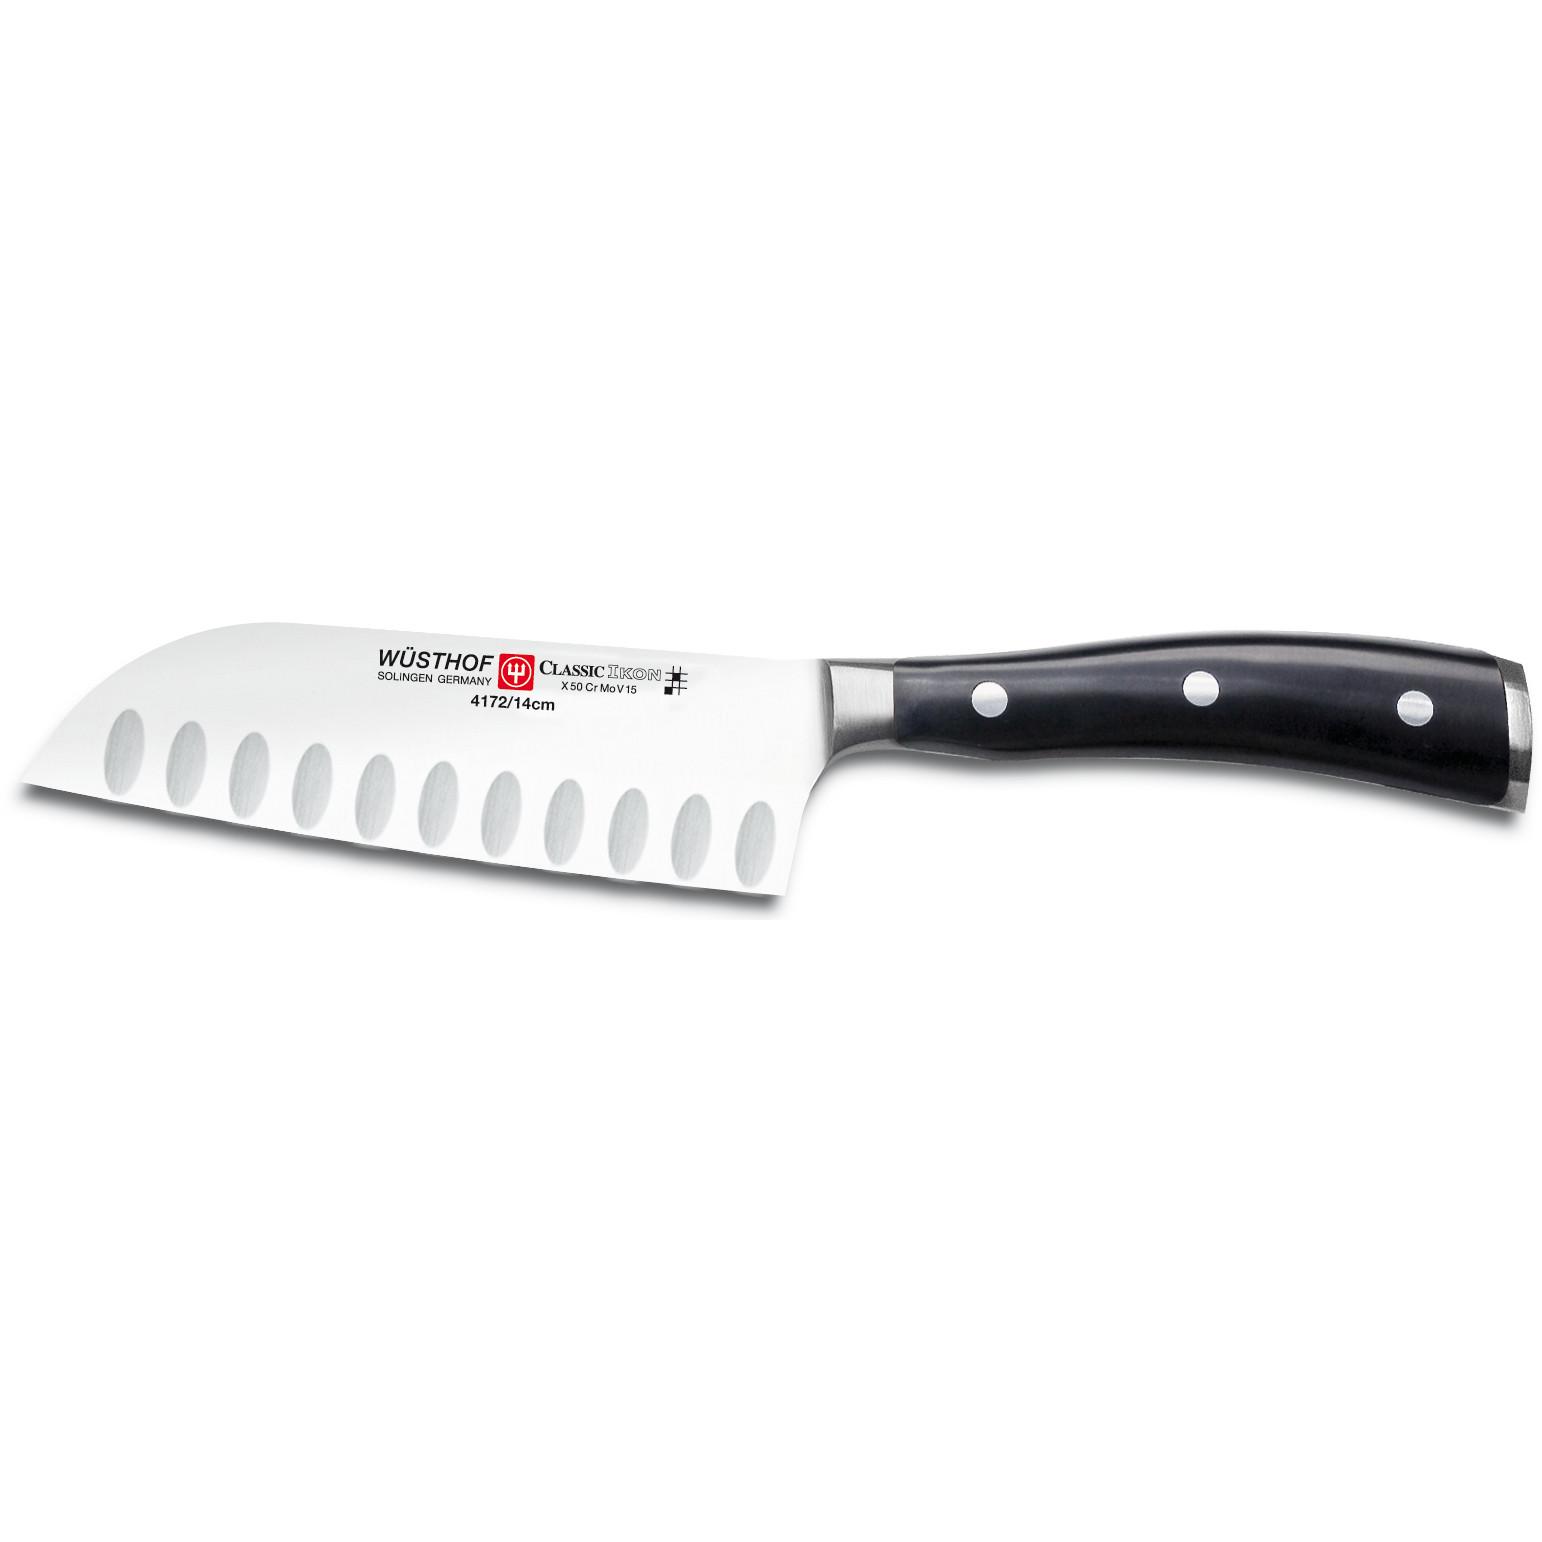 Wusthof Classic Ikon Santoku Knife, 5 Inch